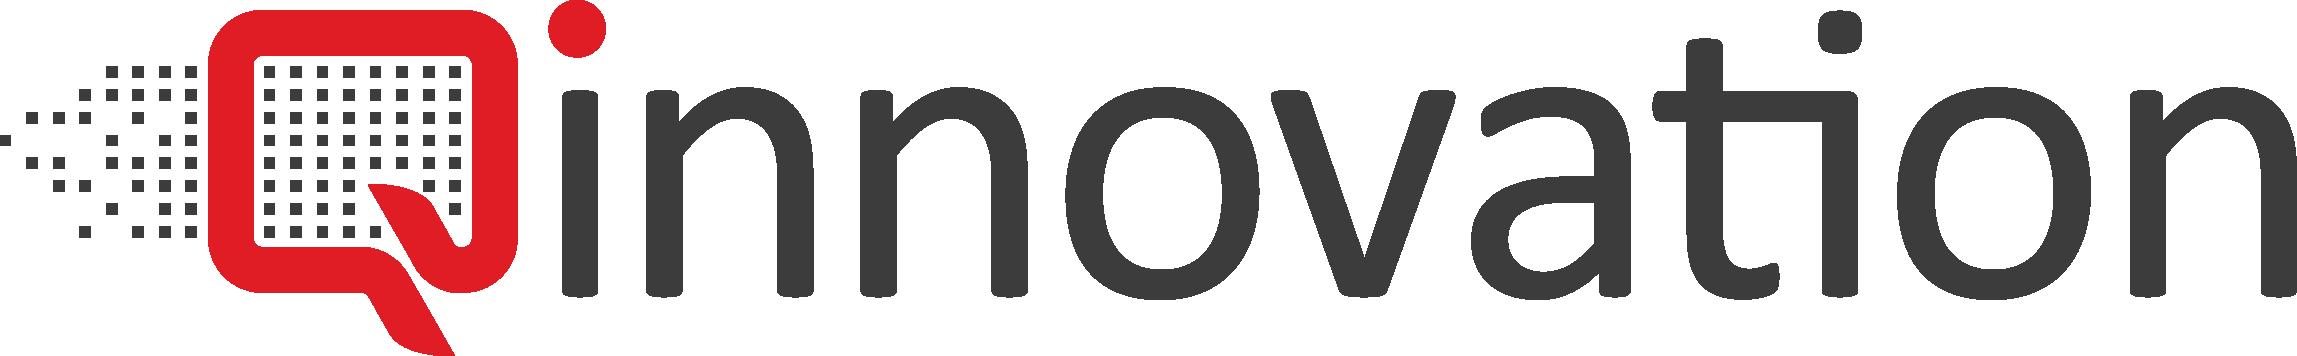 Inbound marketing software success stories customer case studies qinnovation expands its business as a hubspot partner fandeluxe Choice Image